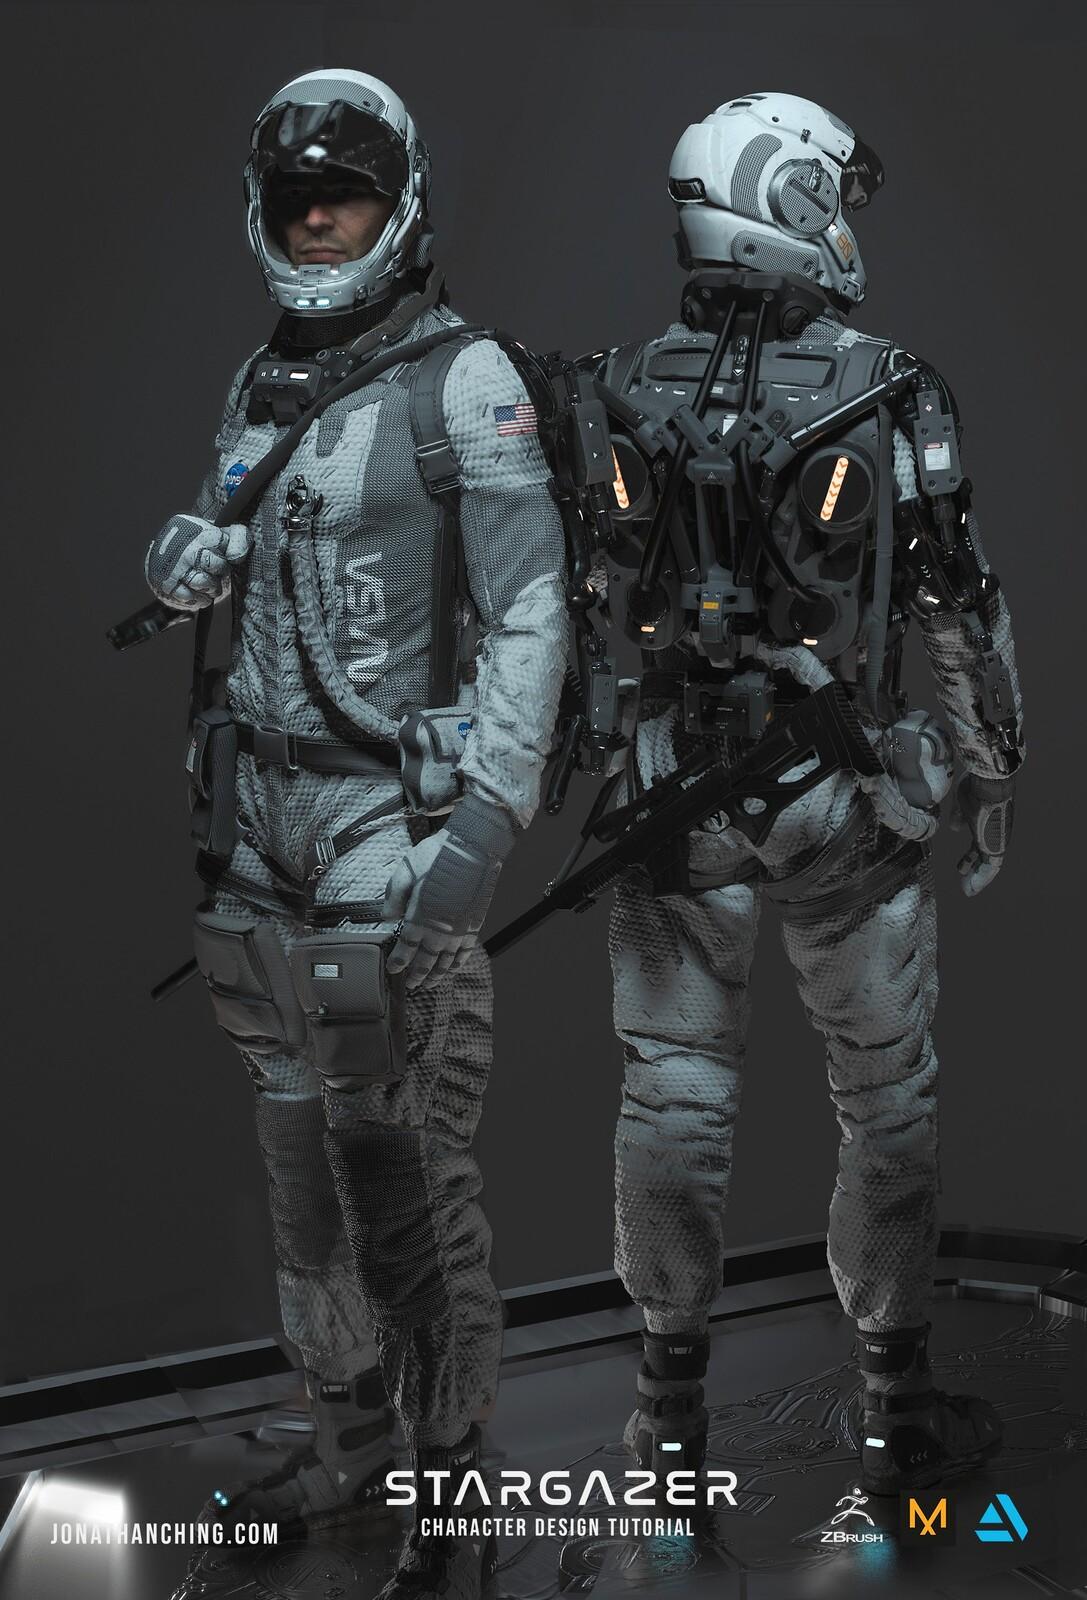 Stargazer: Character Design Tutorial